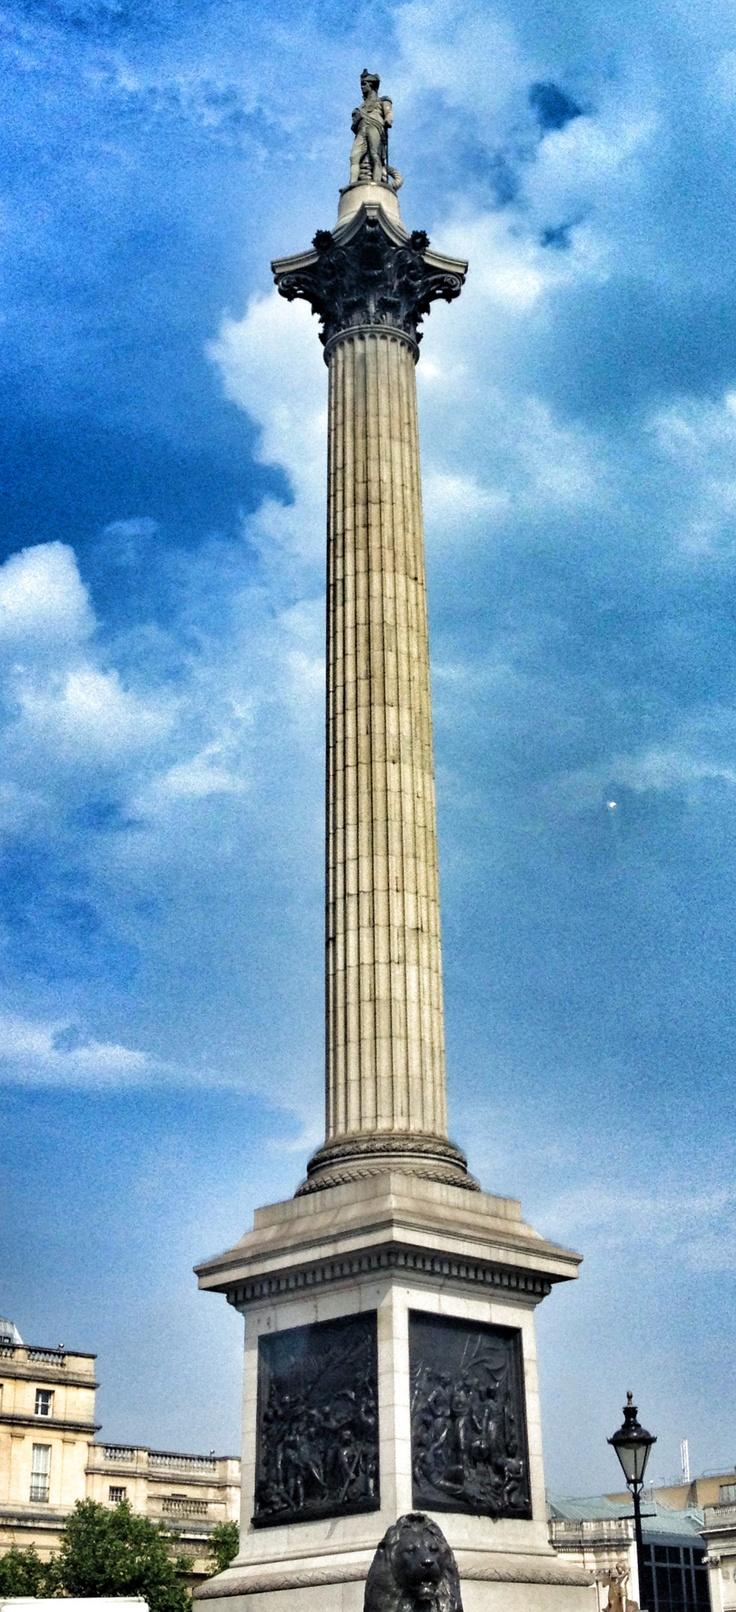 Nelson's Column - Trafalgar Square - shot from swerving cab avoiding Boris bikes.